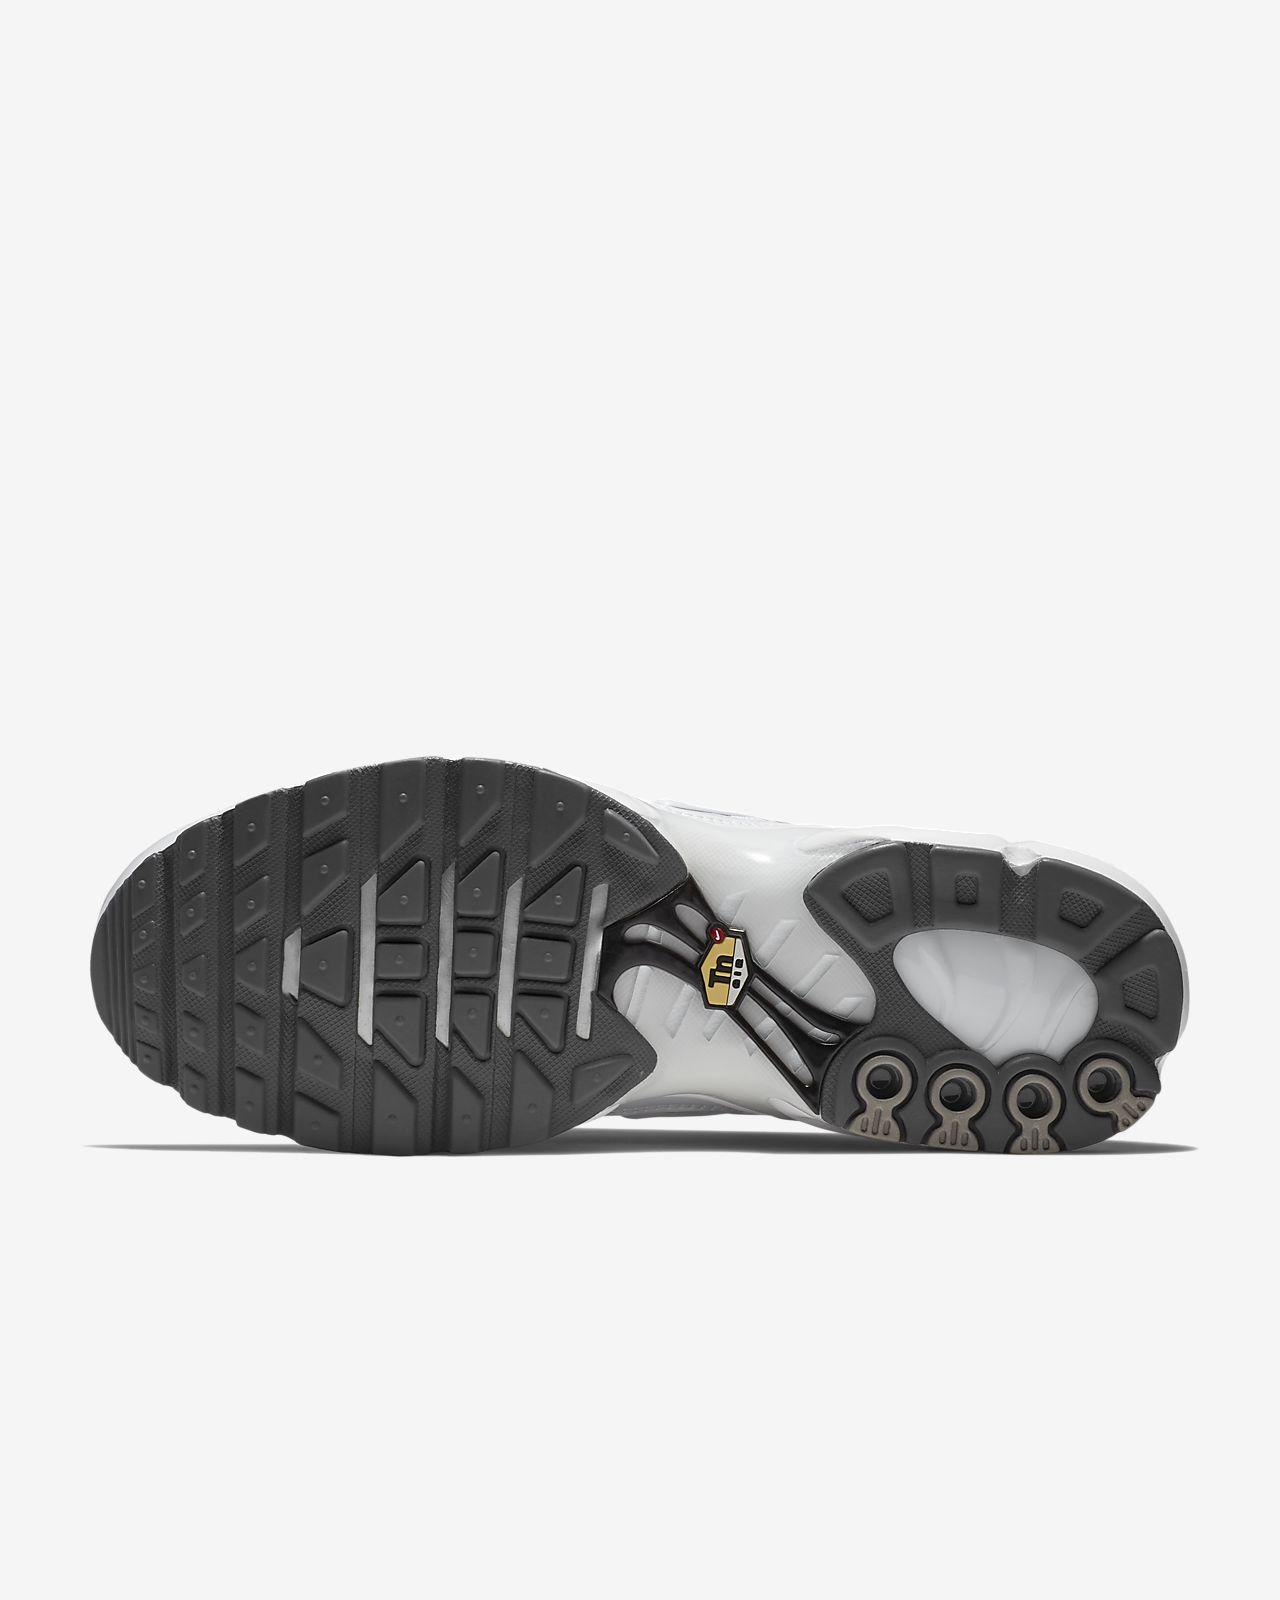 8263884c4f Nike Air Max Plus Men's Shoe. Nike.com GB